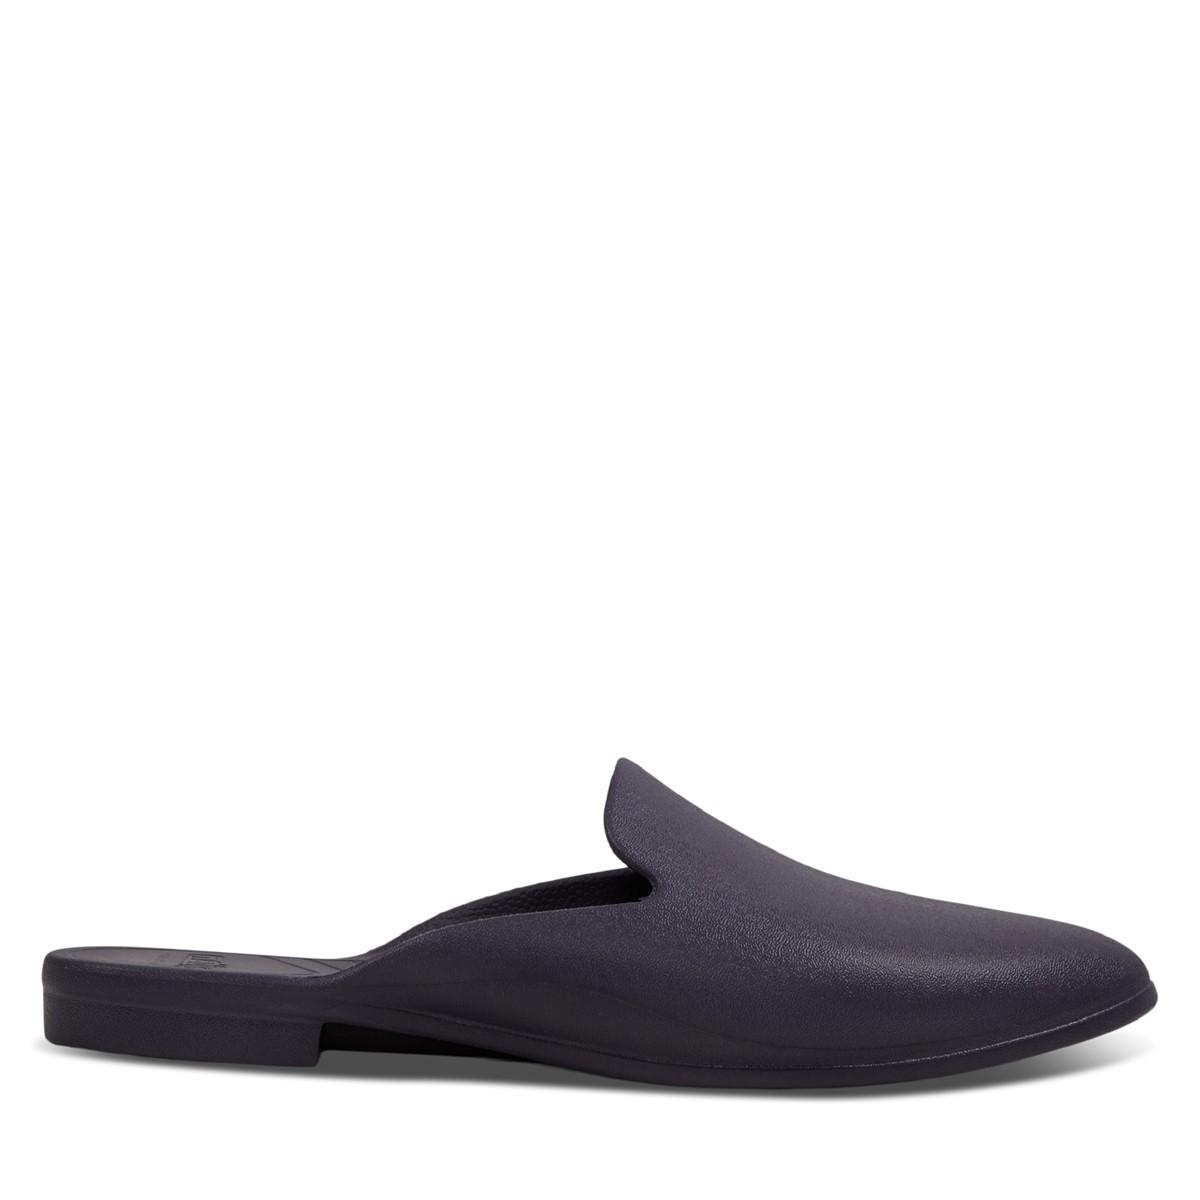 Women's Ava Bloom Sandals in Navy Blue